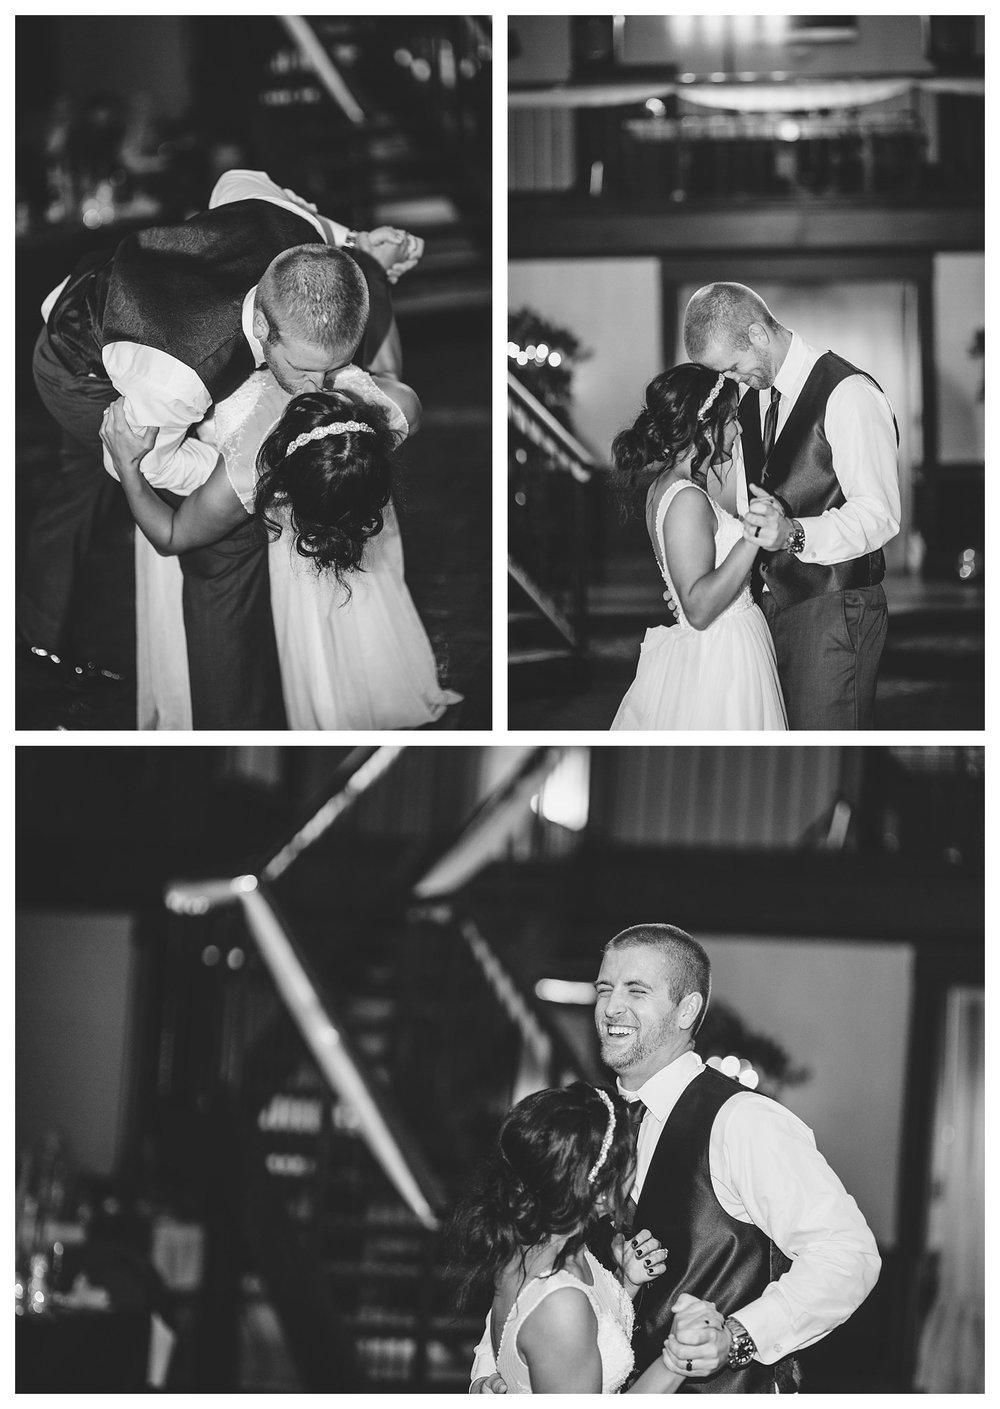 everleigh-photography-cincinnati-wedding-photographer-lake-lyndsay-wedding-hamilton-ohio-33